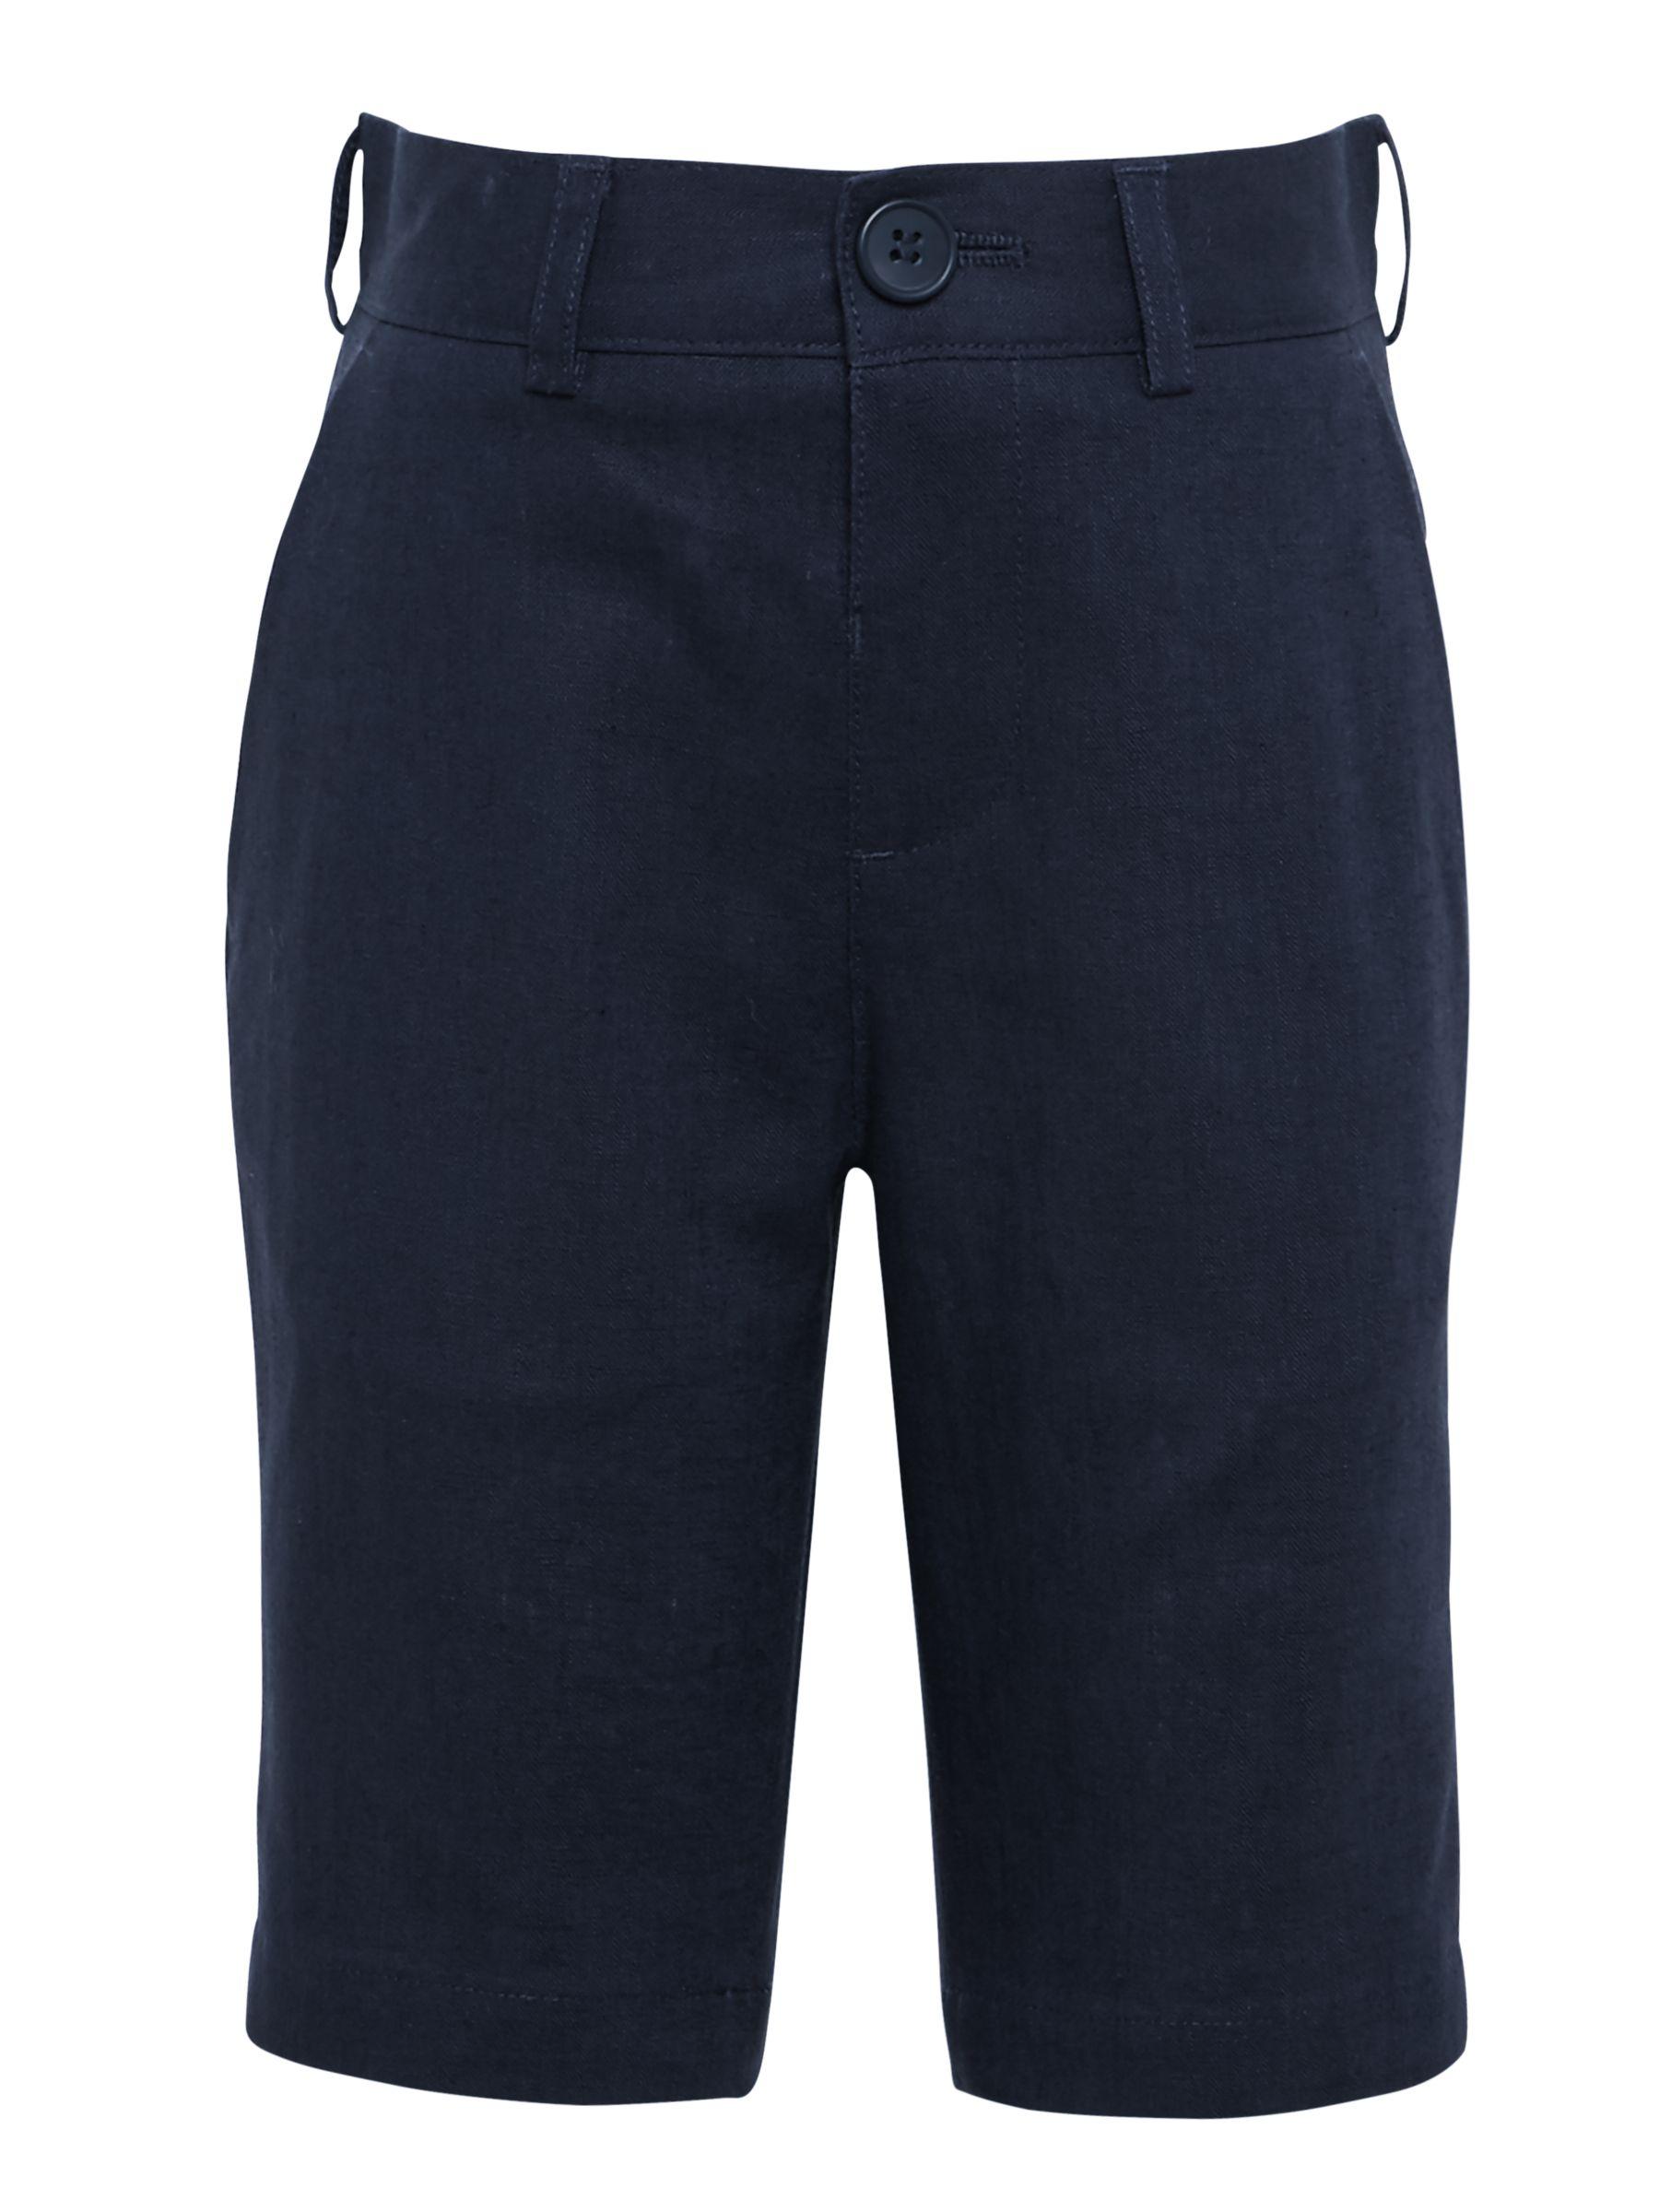 John Lewis Heirloom Collection John Lewis Heirloom Collection Boys' Linen Cotton Shorts